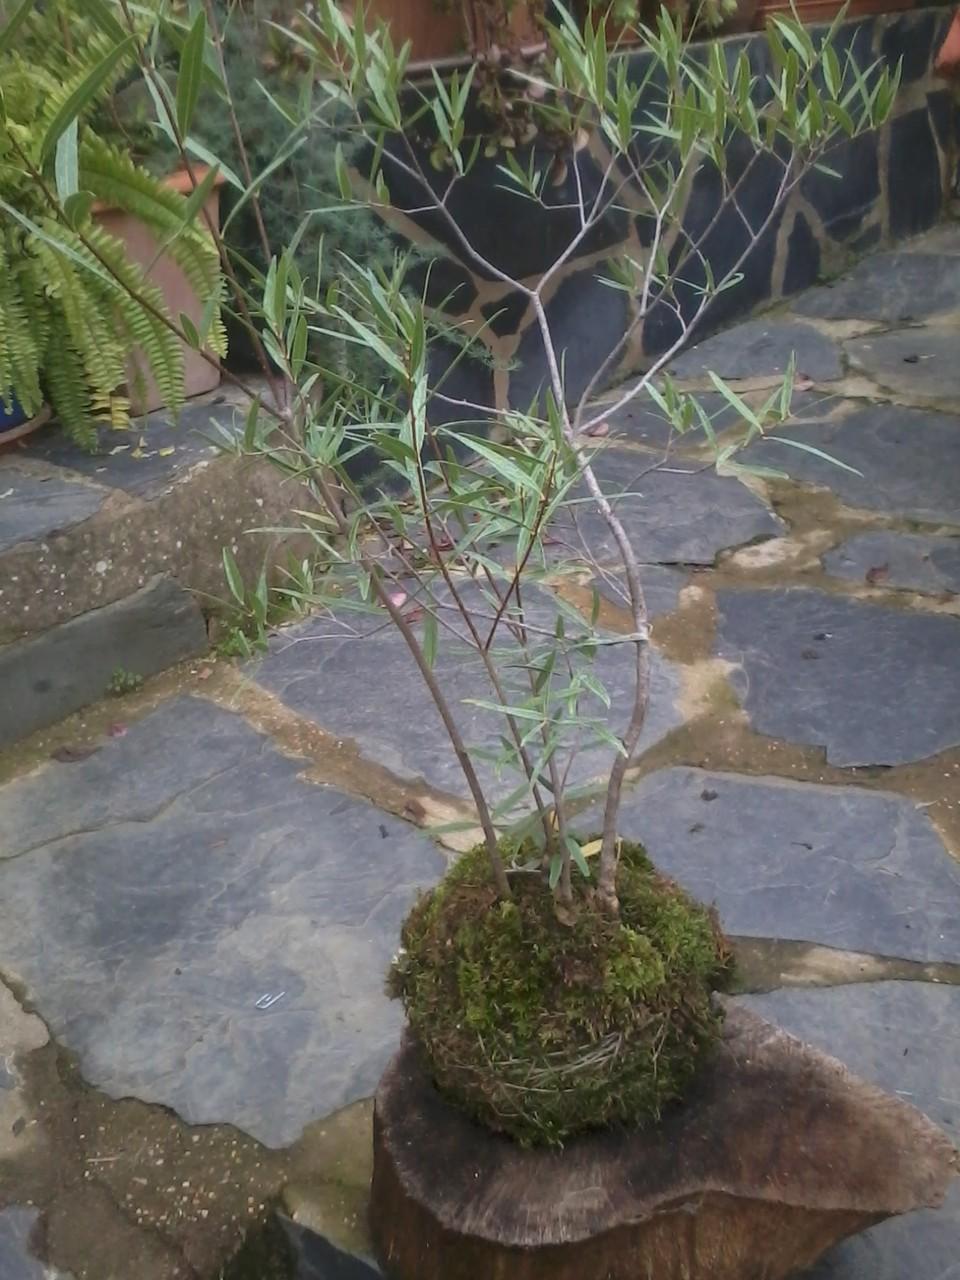 Kokedama Labiérnago (Phillyrea angustifolia)